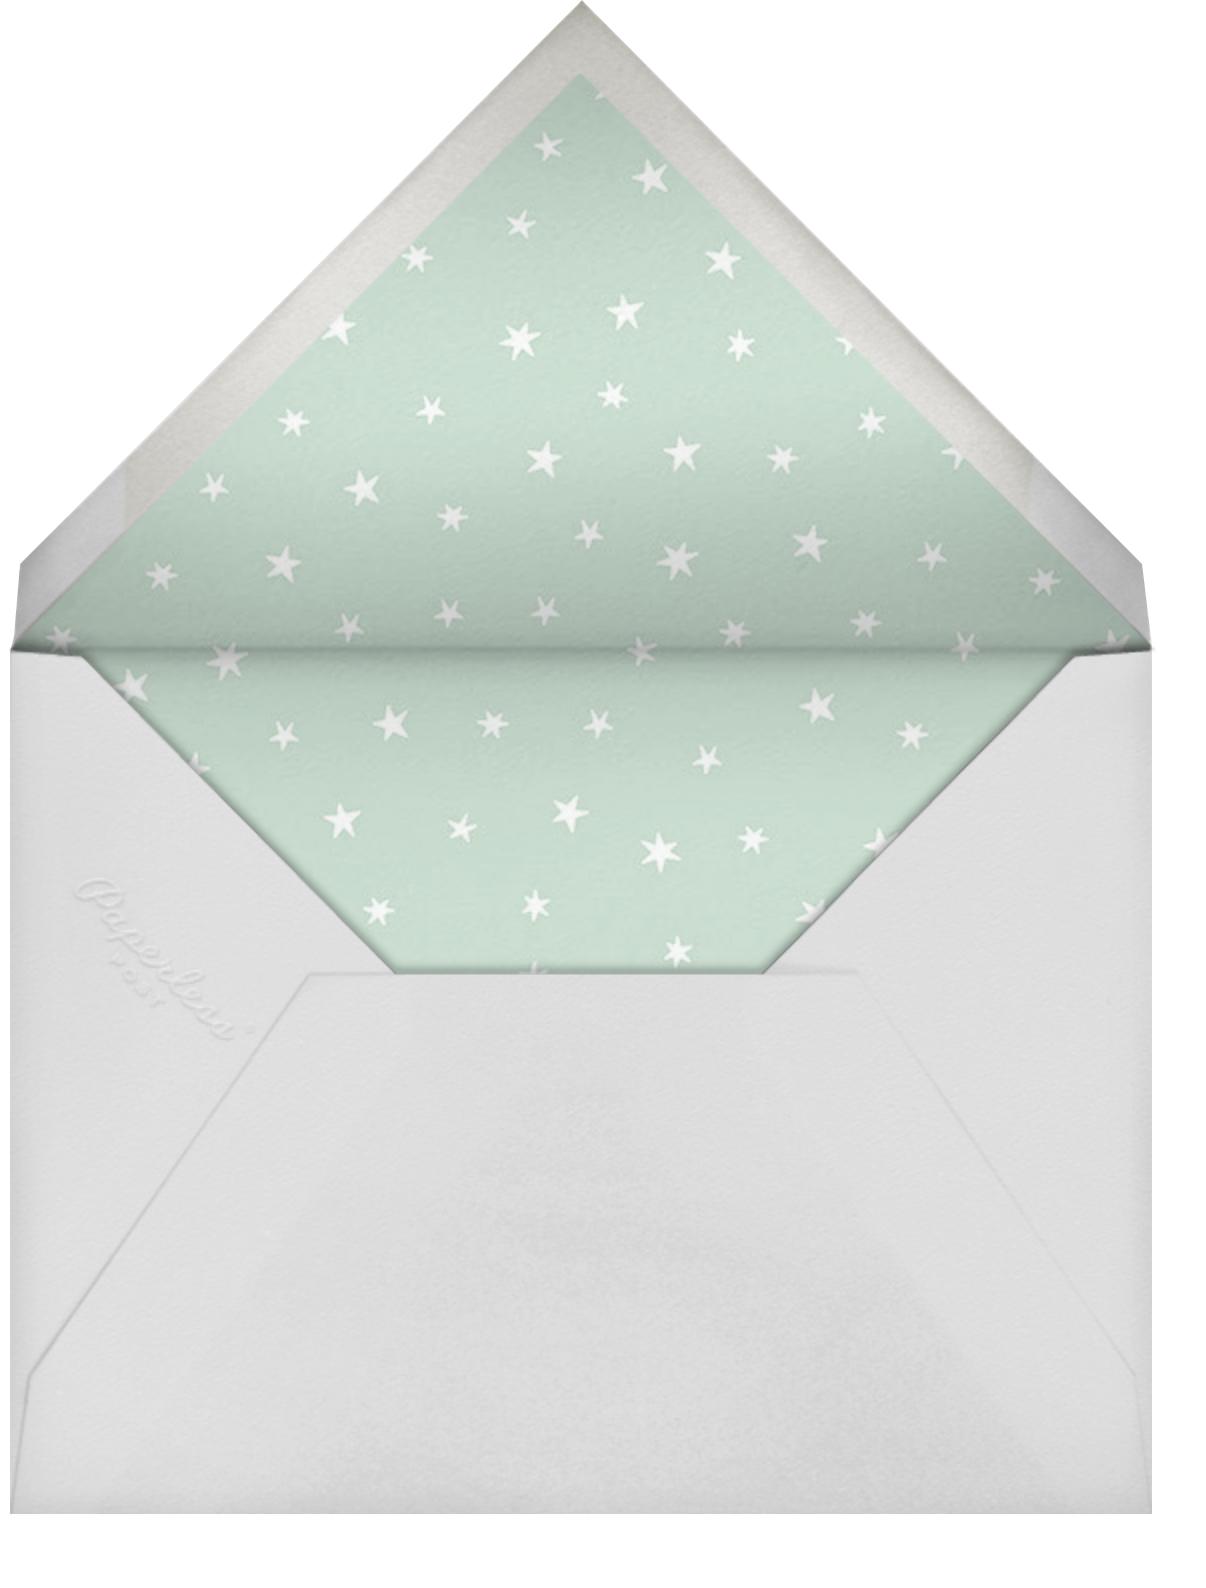 Starry Slumber (Invitation) - Silver - Paperless Post - Envelope